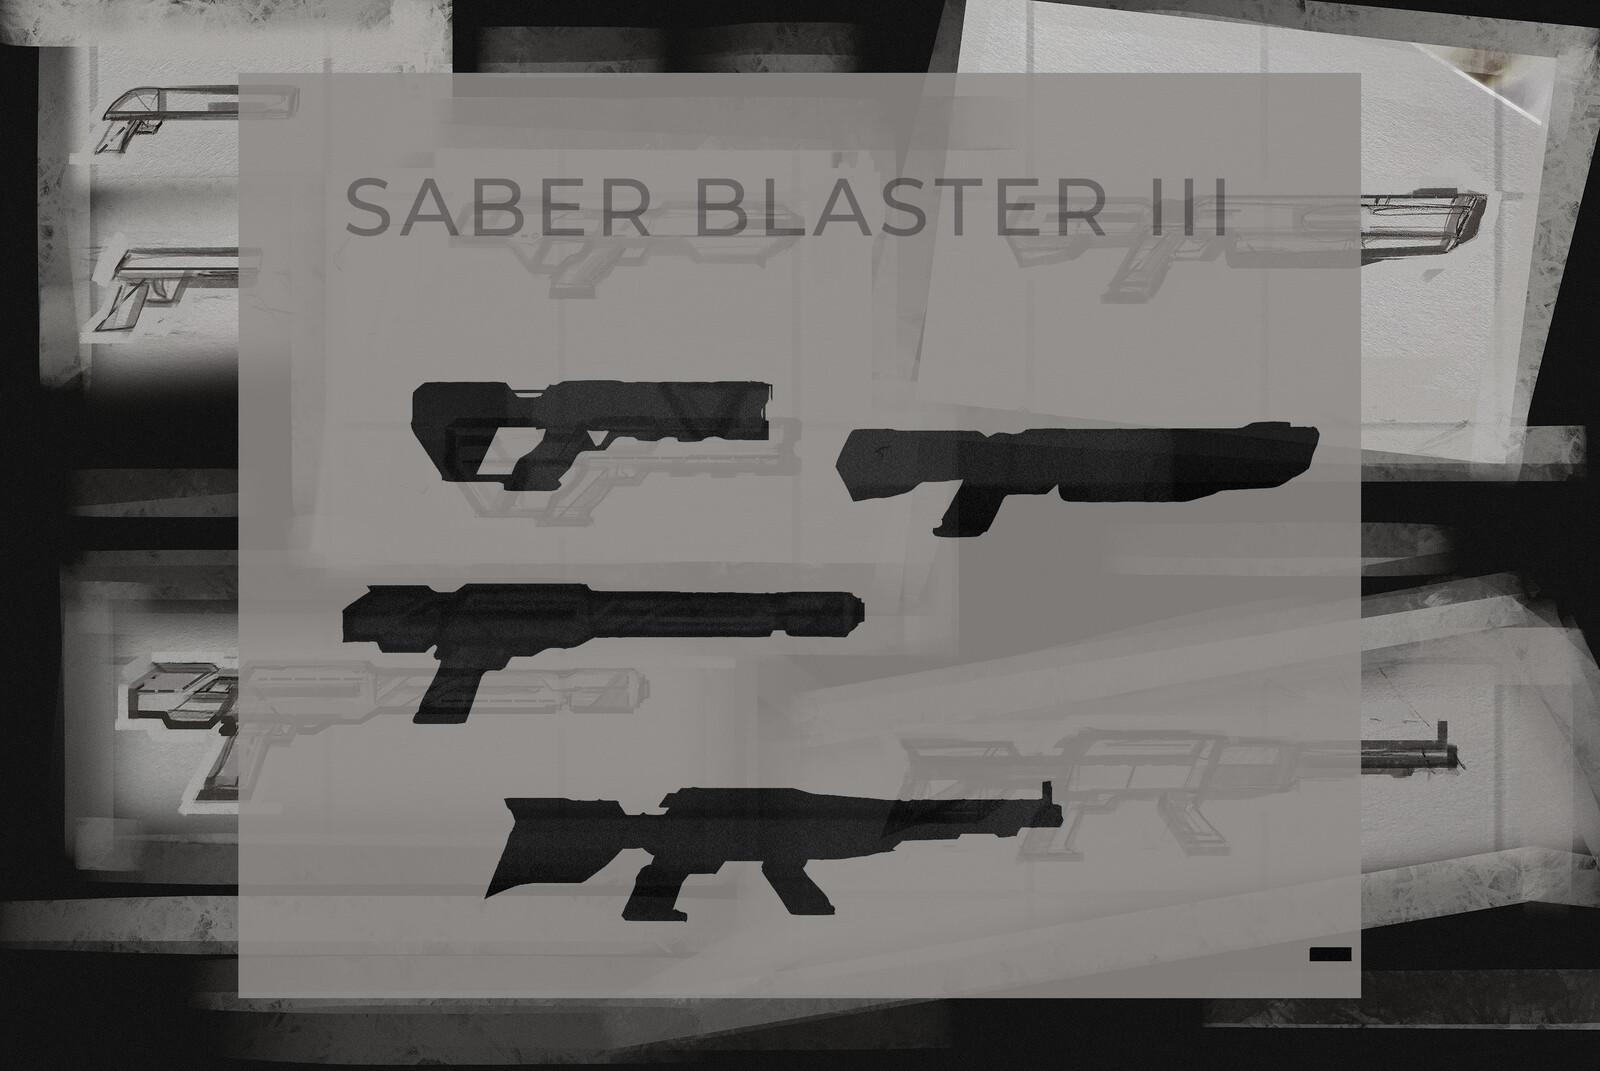 SABER Blaster III